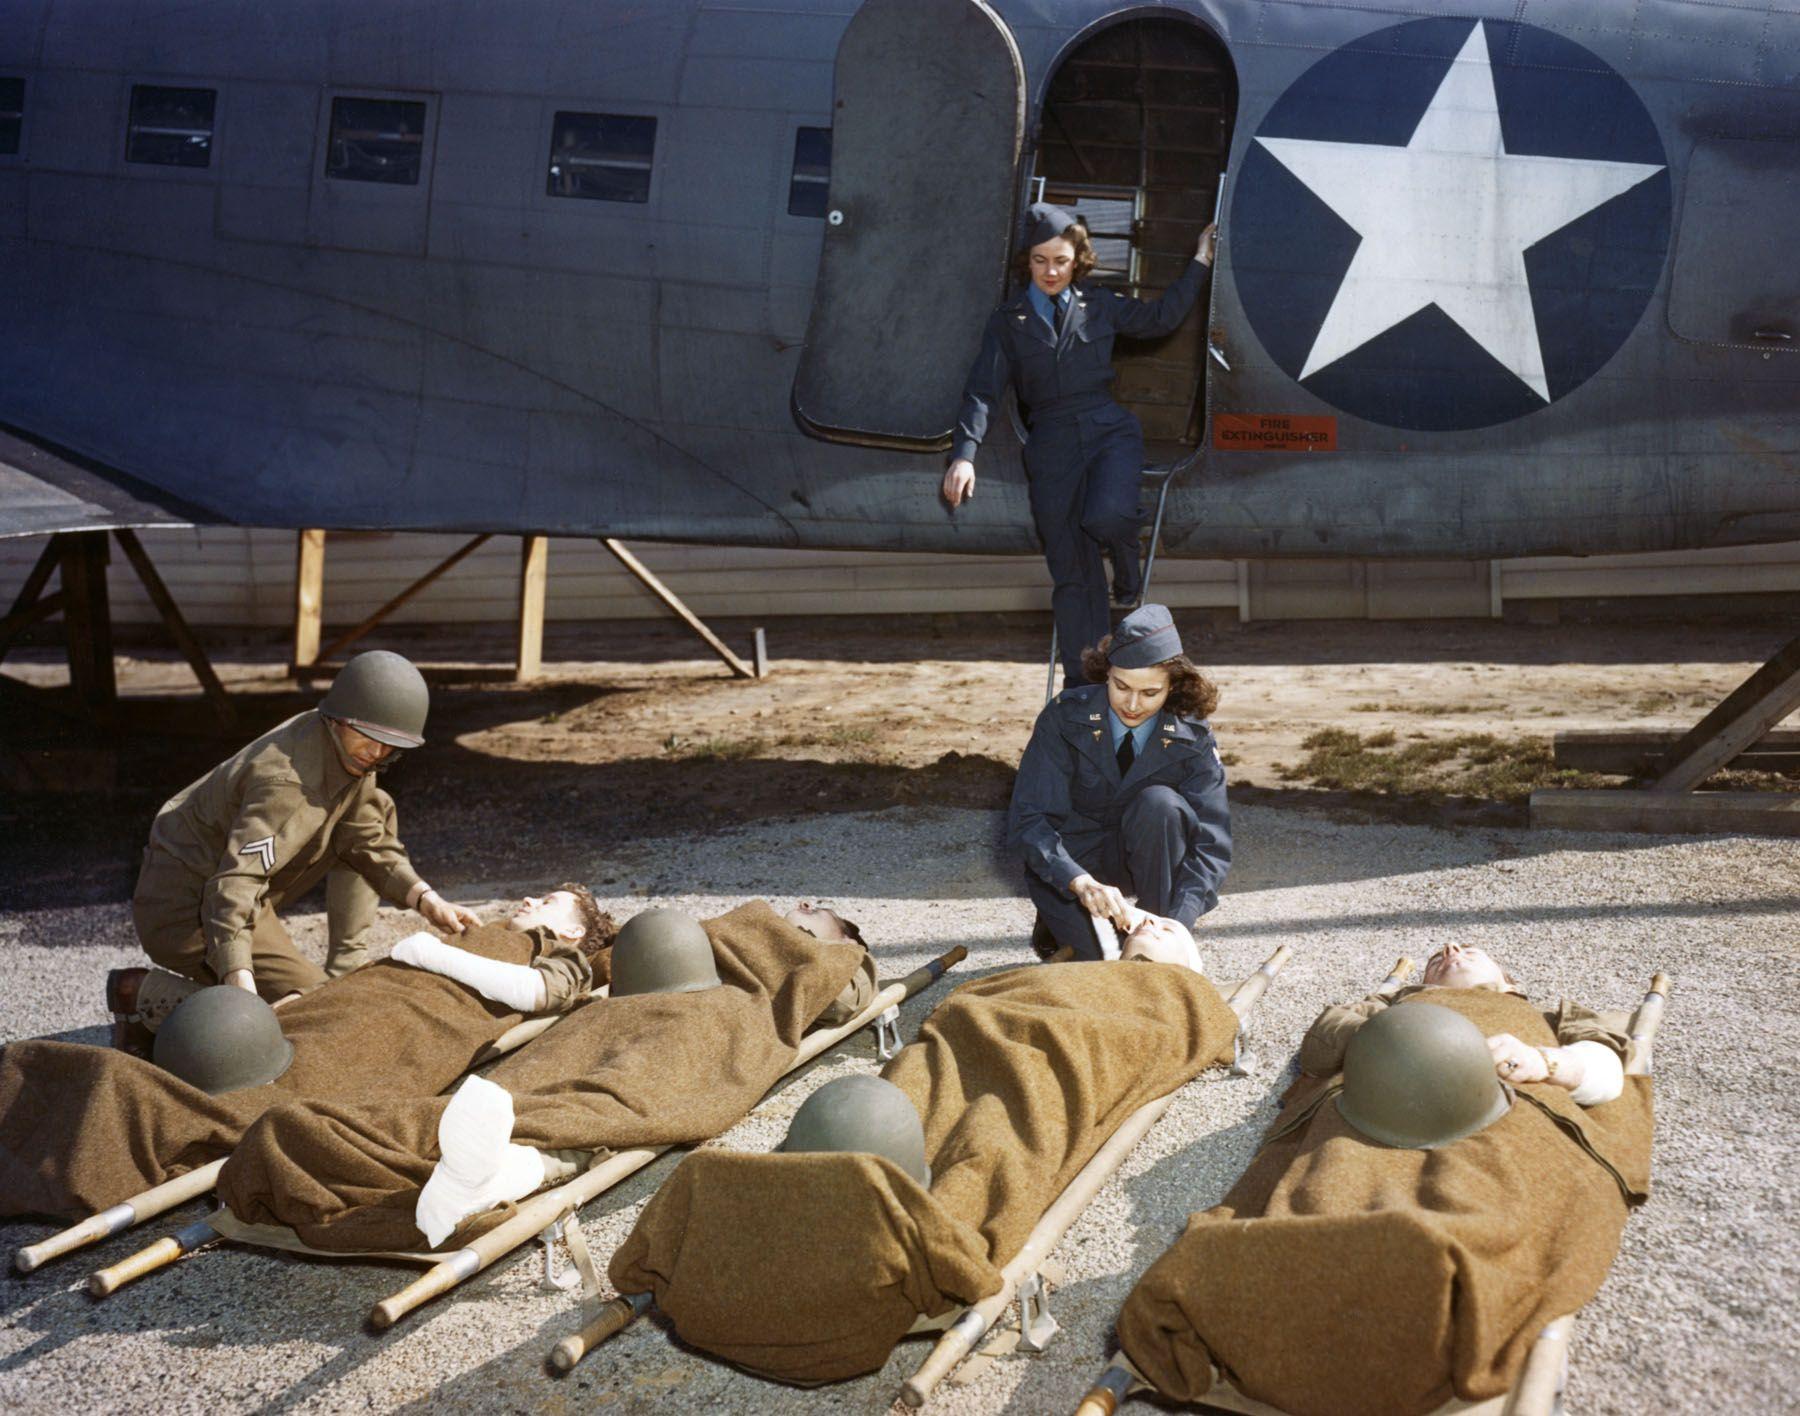 At the Army Air Force School of Air Evacuation at Bowman